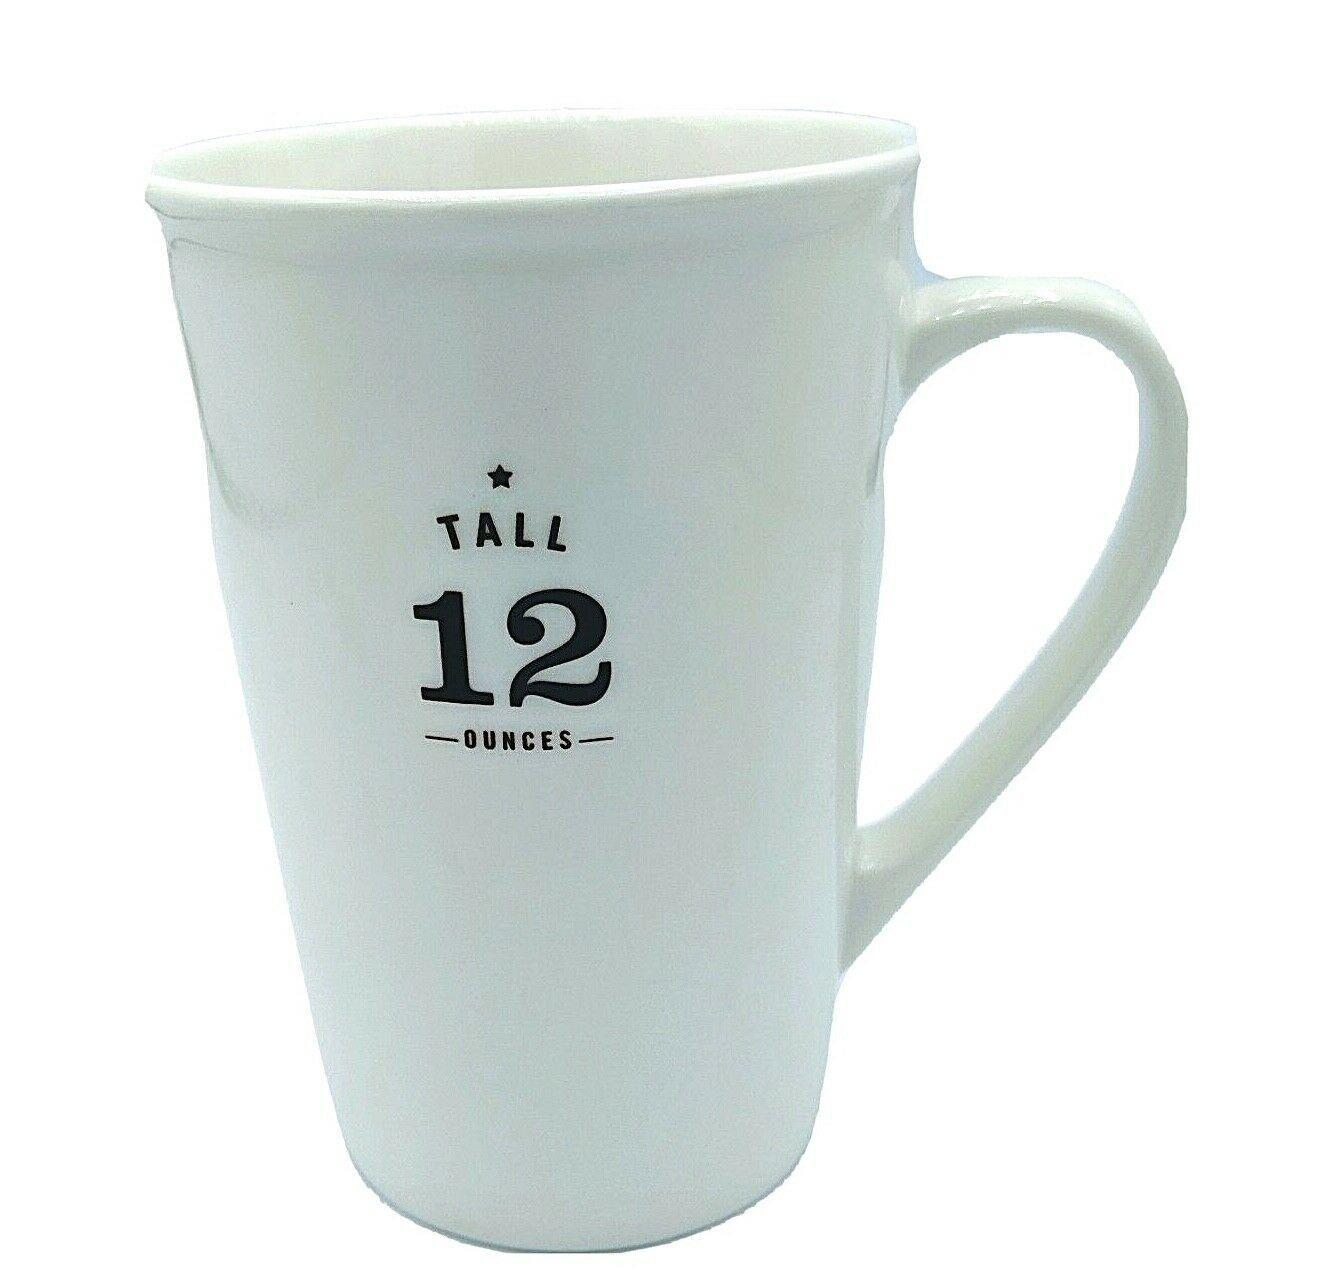 Starbucks 2010 TALL 12 OUNCES White Ceramic Coffee Mug w/ Brown Letters Est.1971 - $18.95